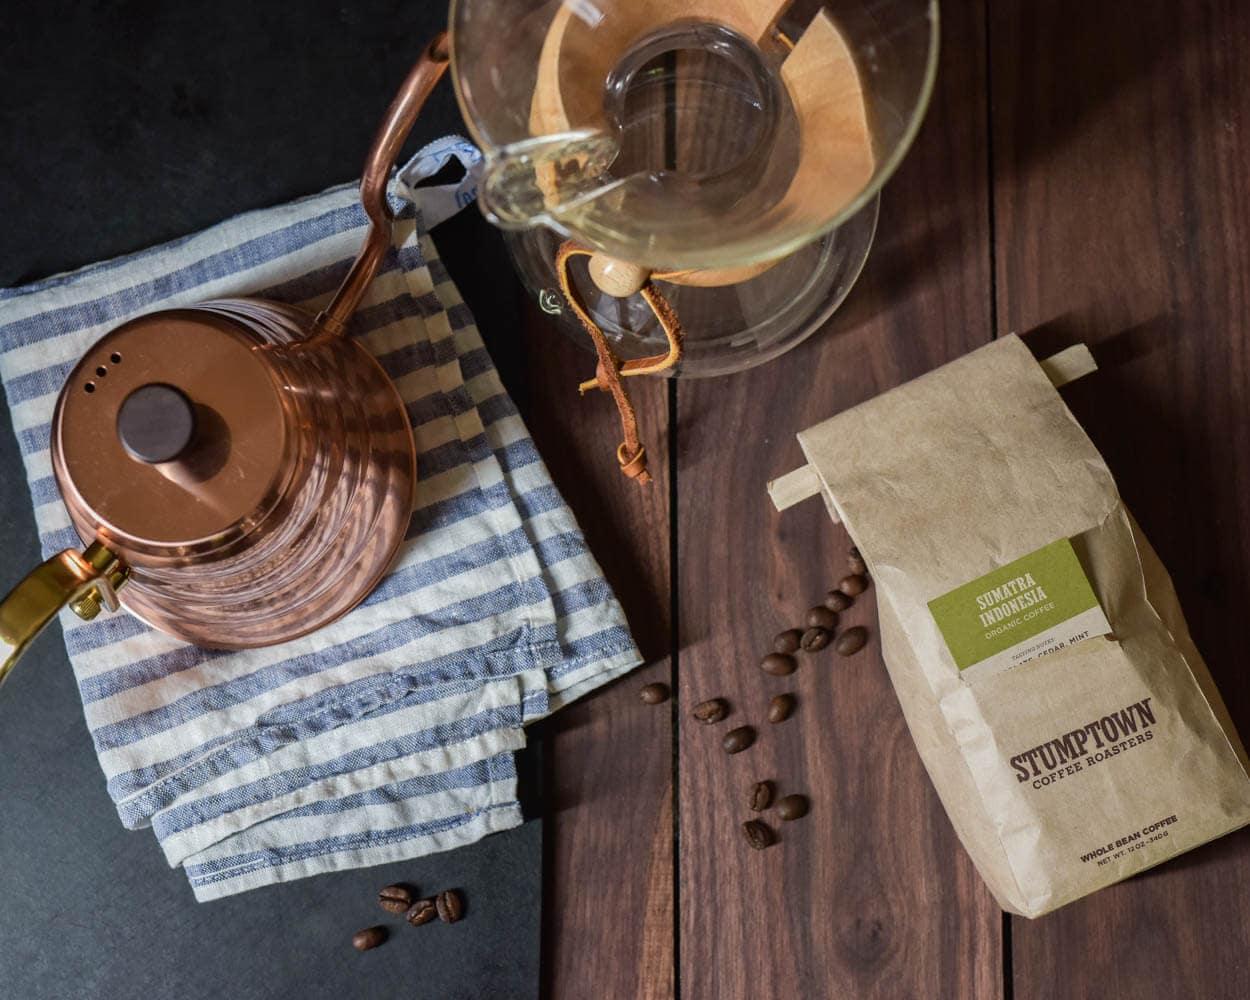 Morning Stumptown coffee before making 50% fresh milled whole wheat sourdough